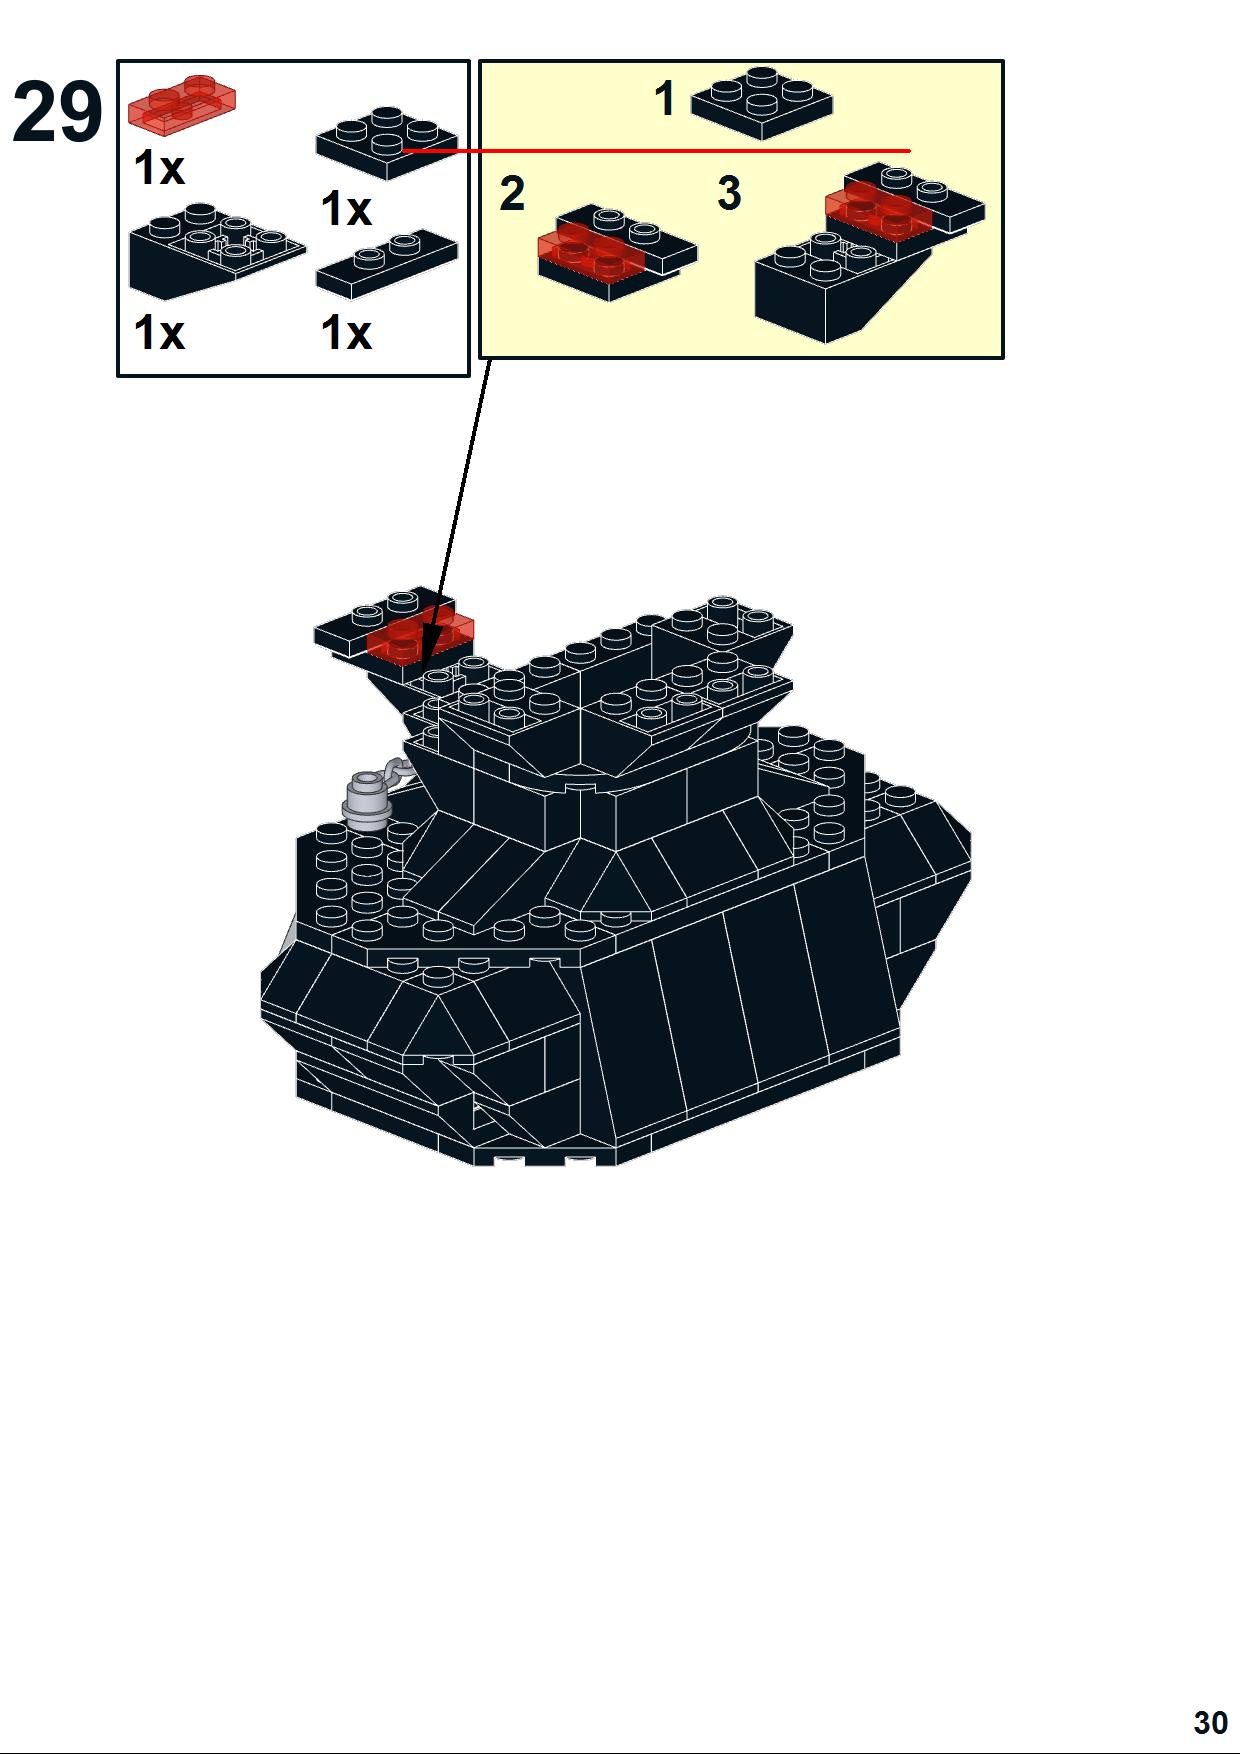 75227 - Darth Vader bust - original_page_30